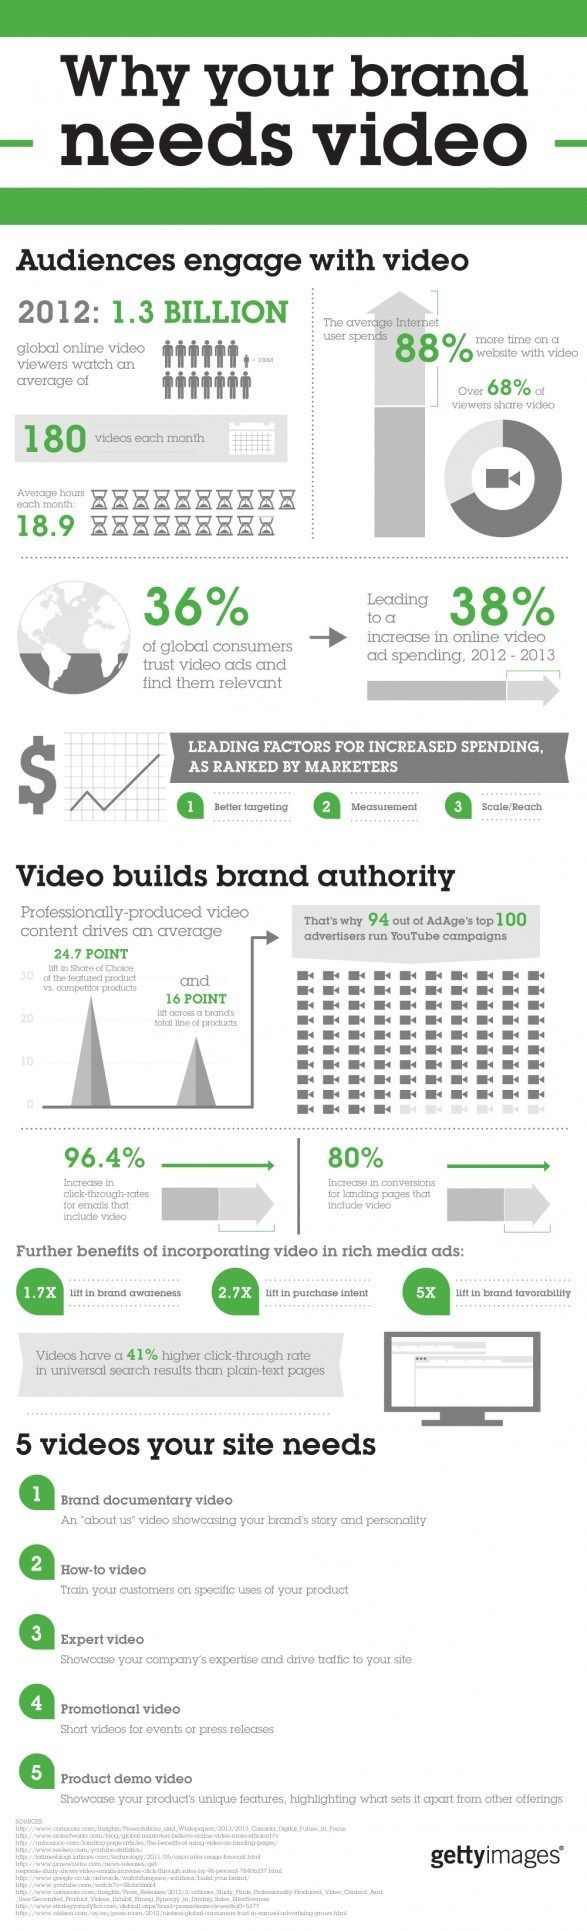 Why your brand needs video? #infographic #marketing RefugeMarketing.com